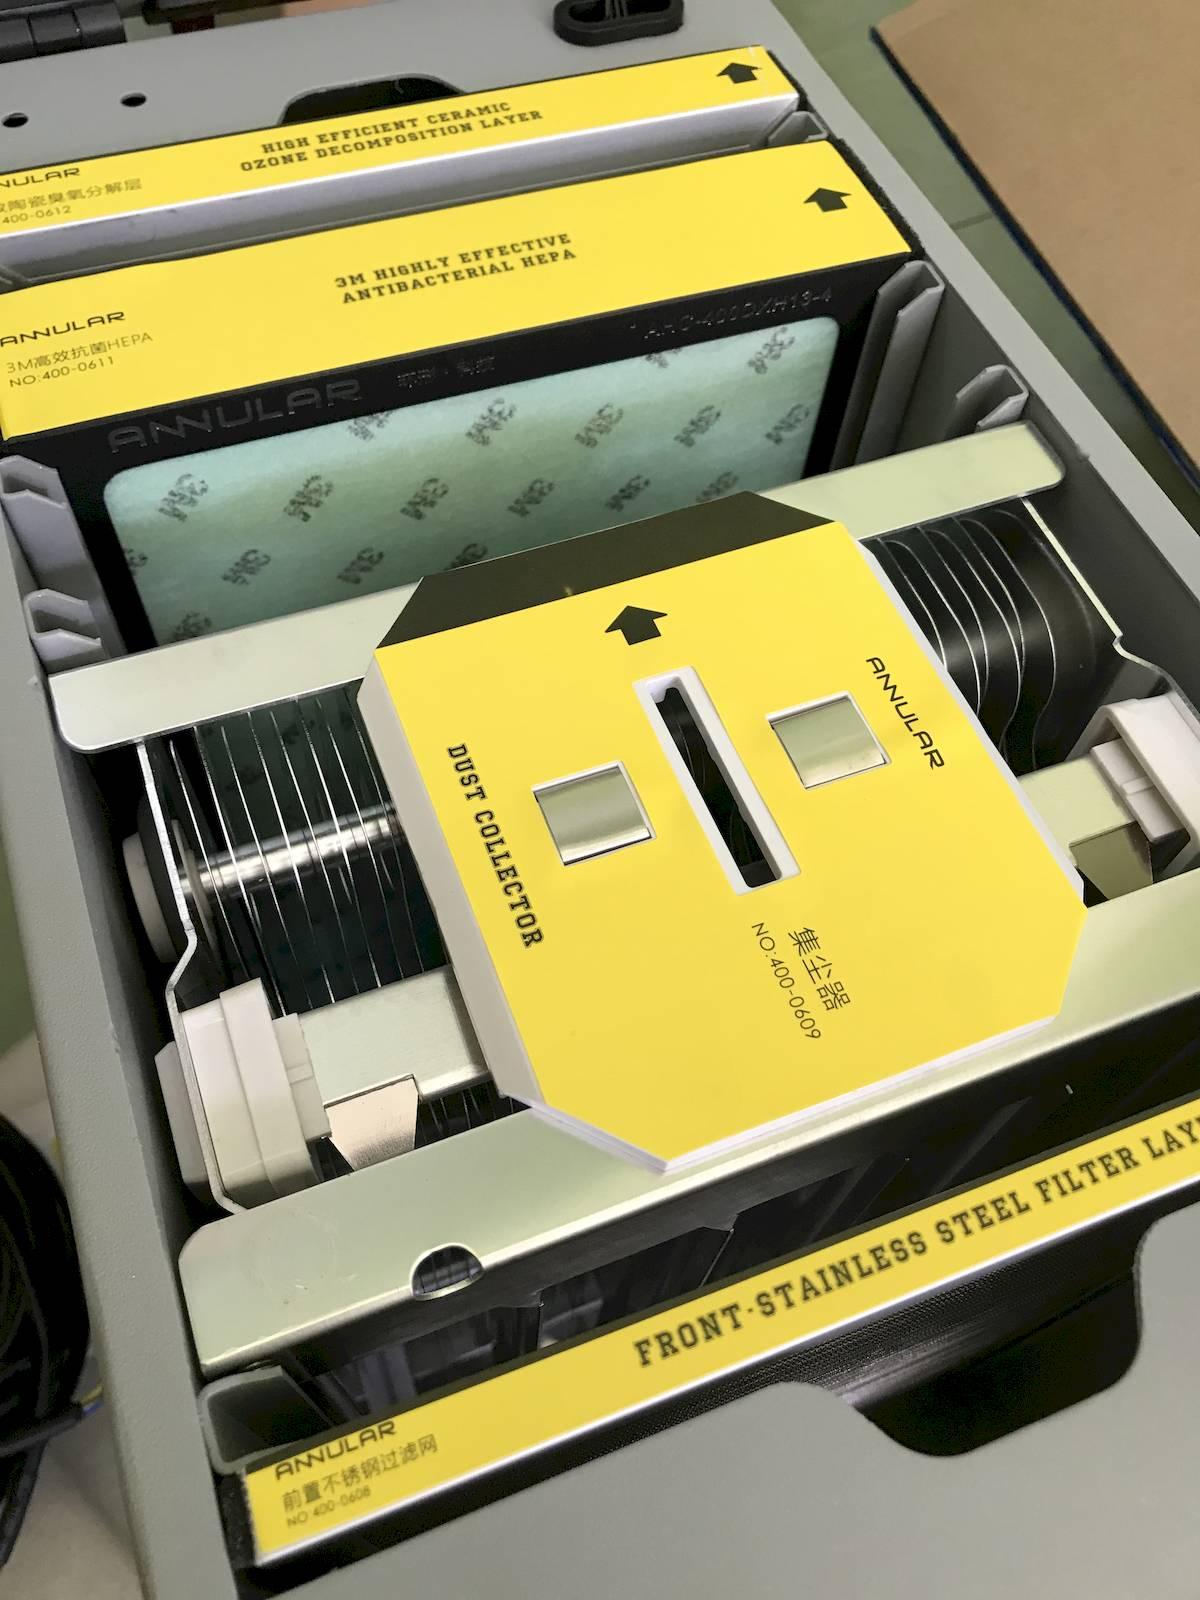 Ceiling-mounted Air Sterilizer UVGI Electrostatic Precipitation Washable